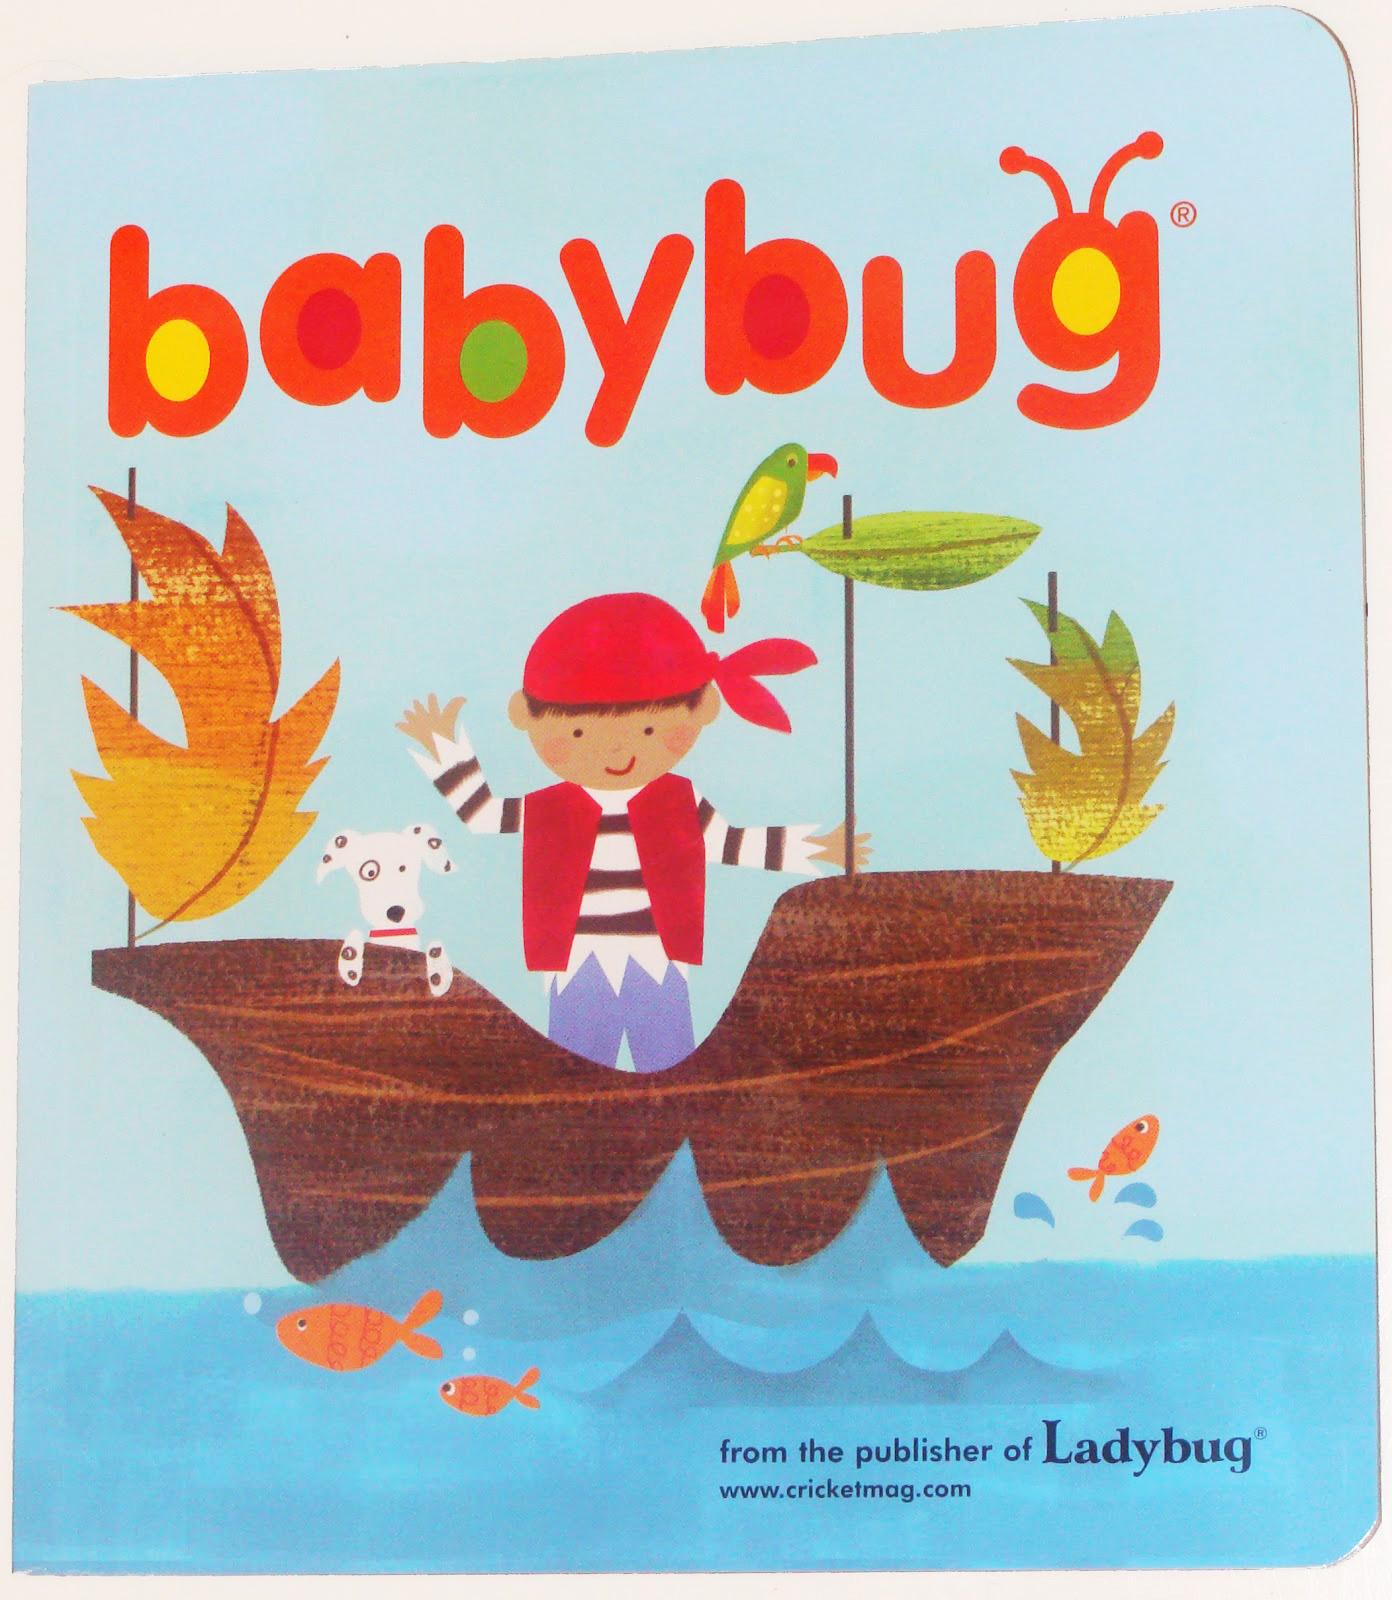 Amy Schimler-Safford: Babybug Magazine